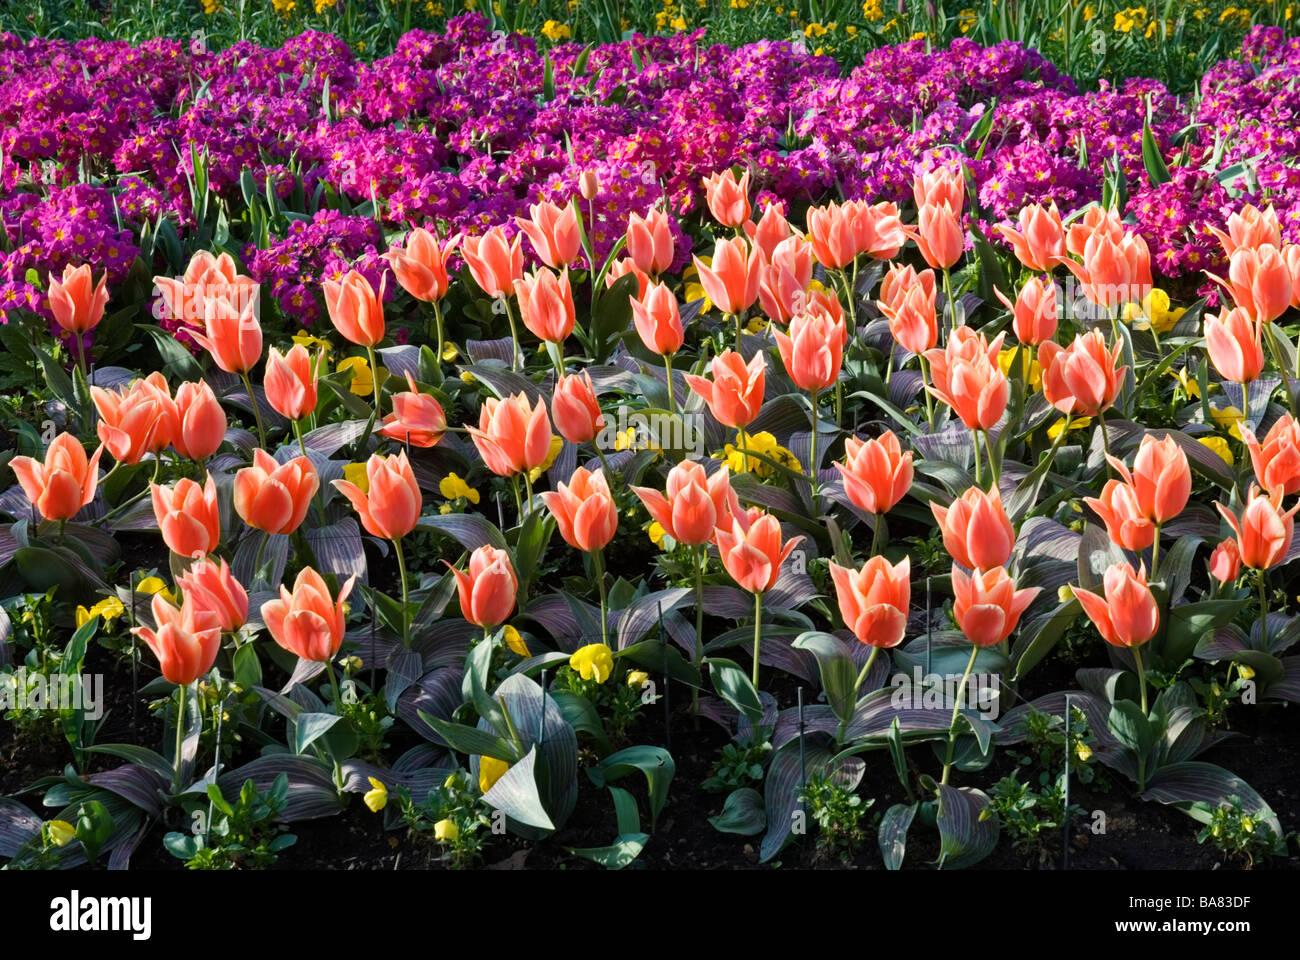 tulip flower beds in spring, st. james's park london england uk